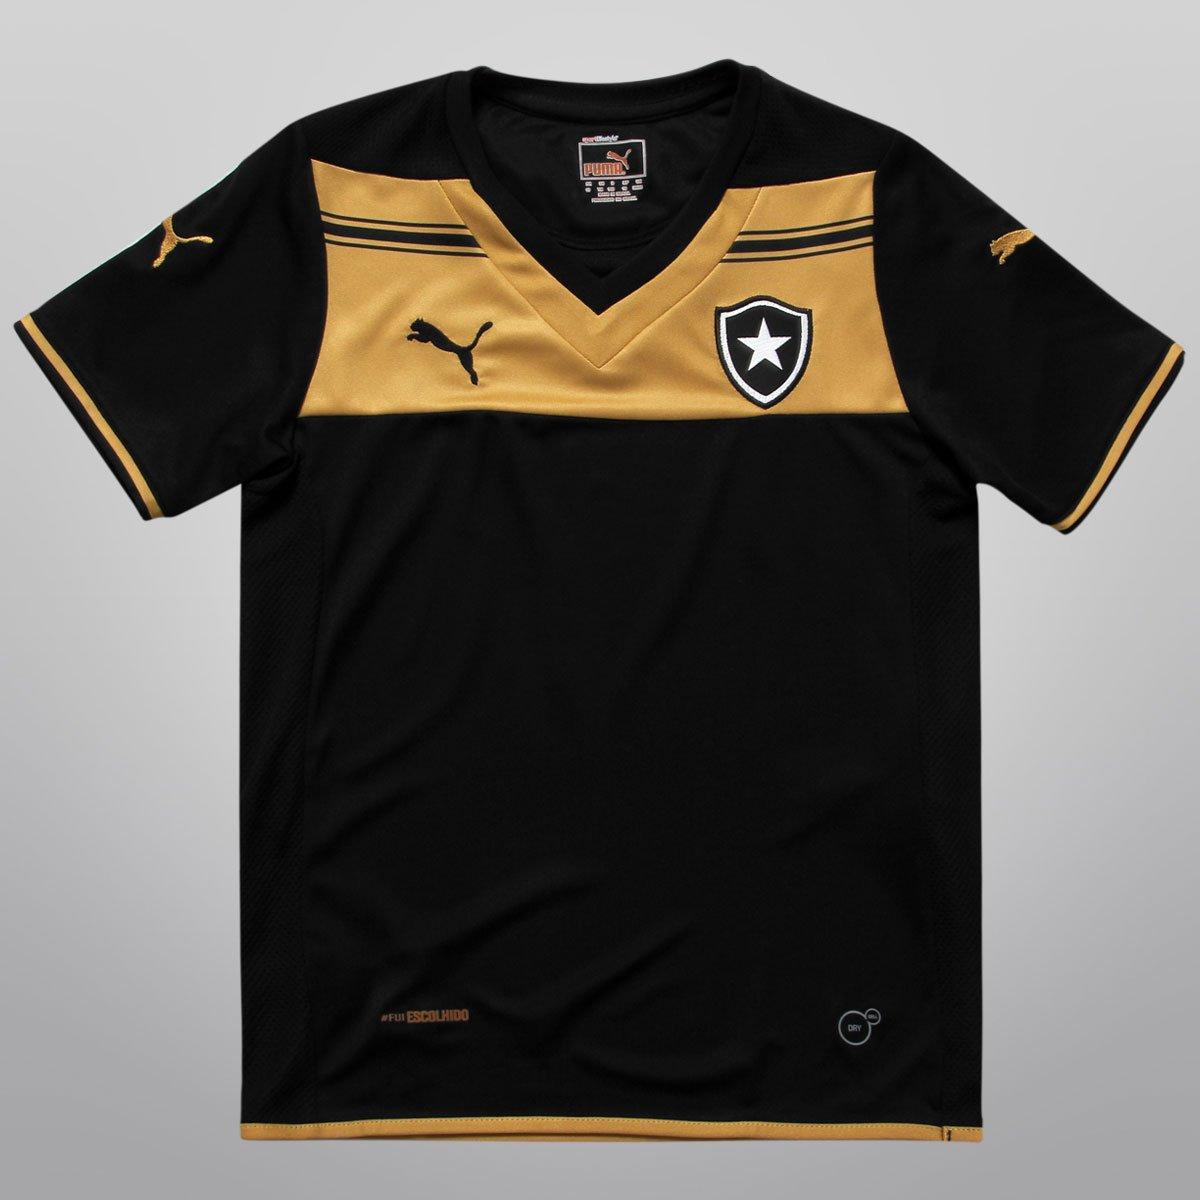 7110ee5cd0635 Camisa Puma Botafogo II 2014 s nº Infantil - Compre Agora